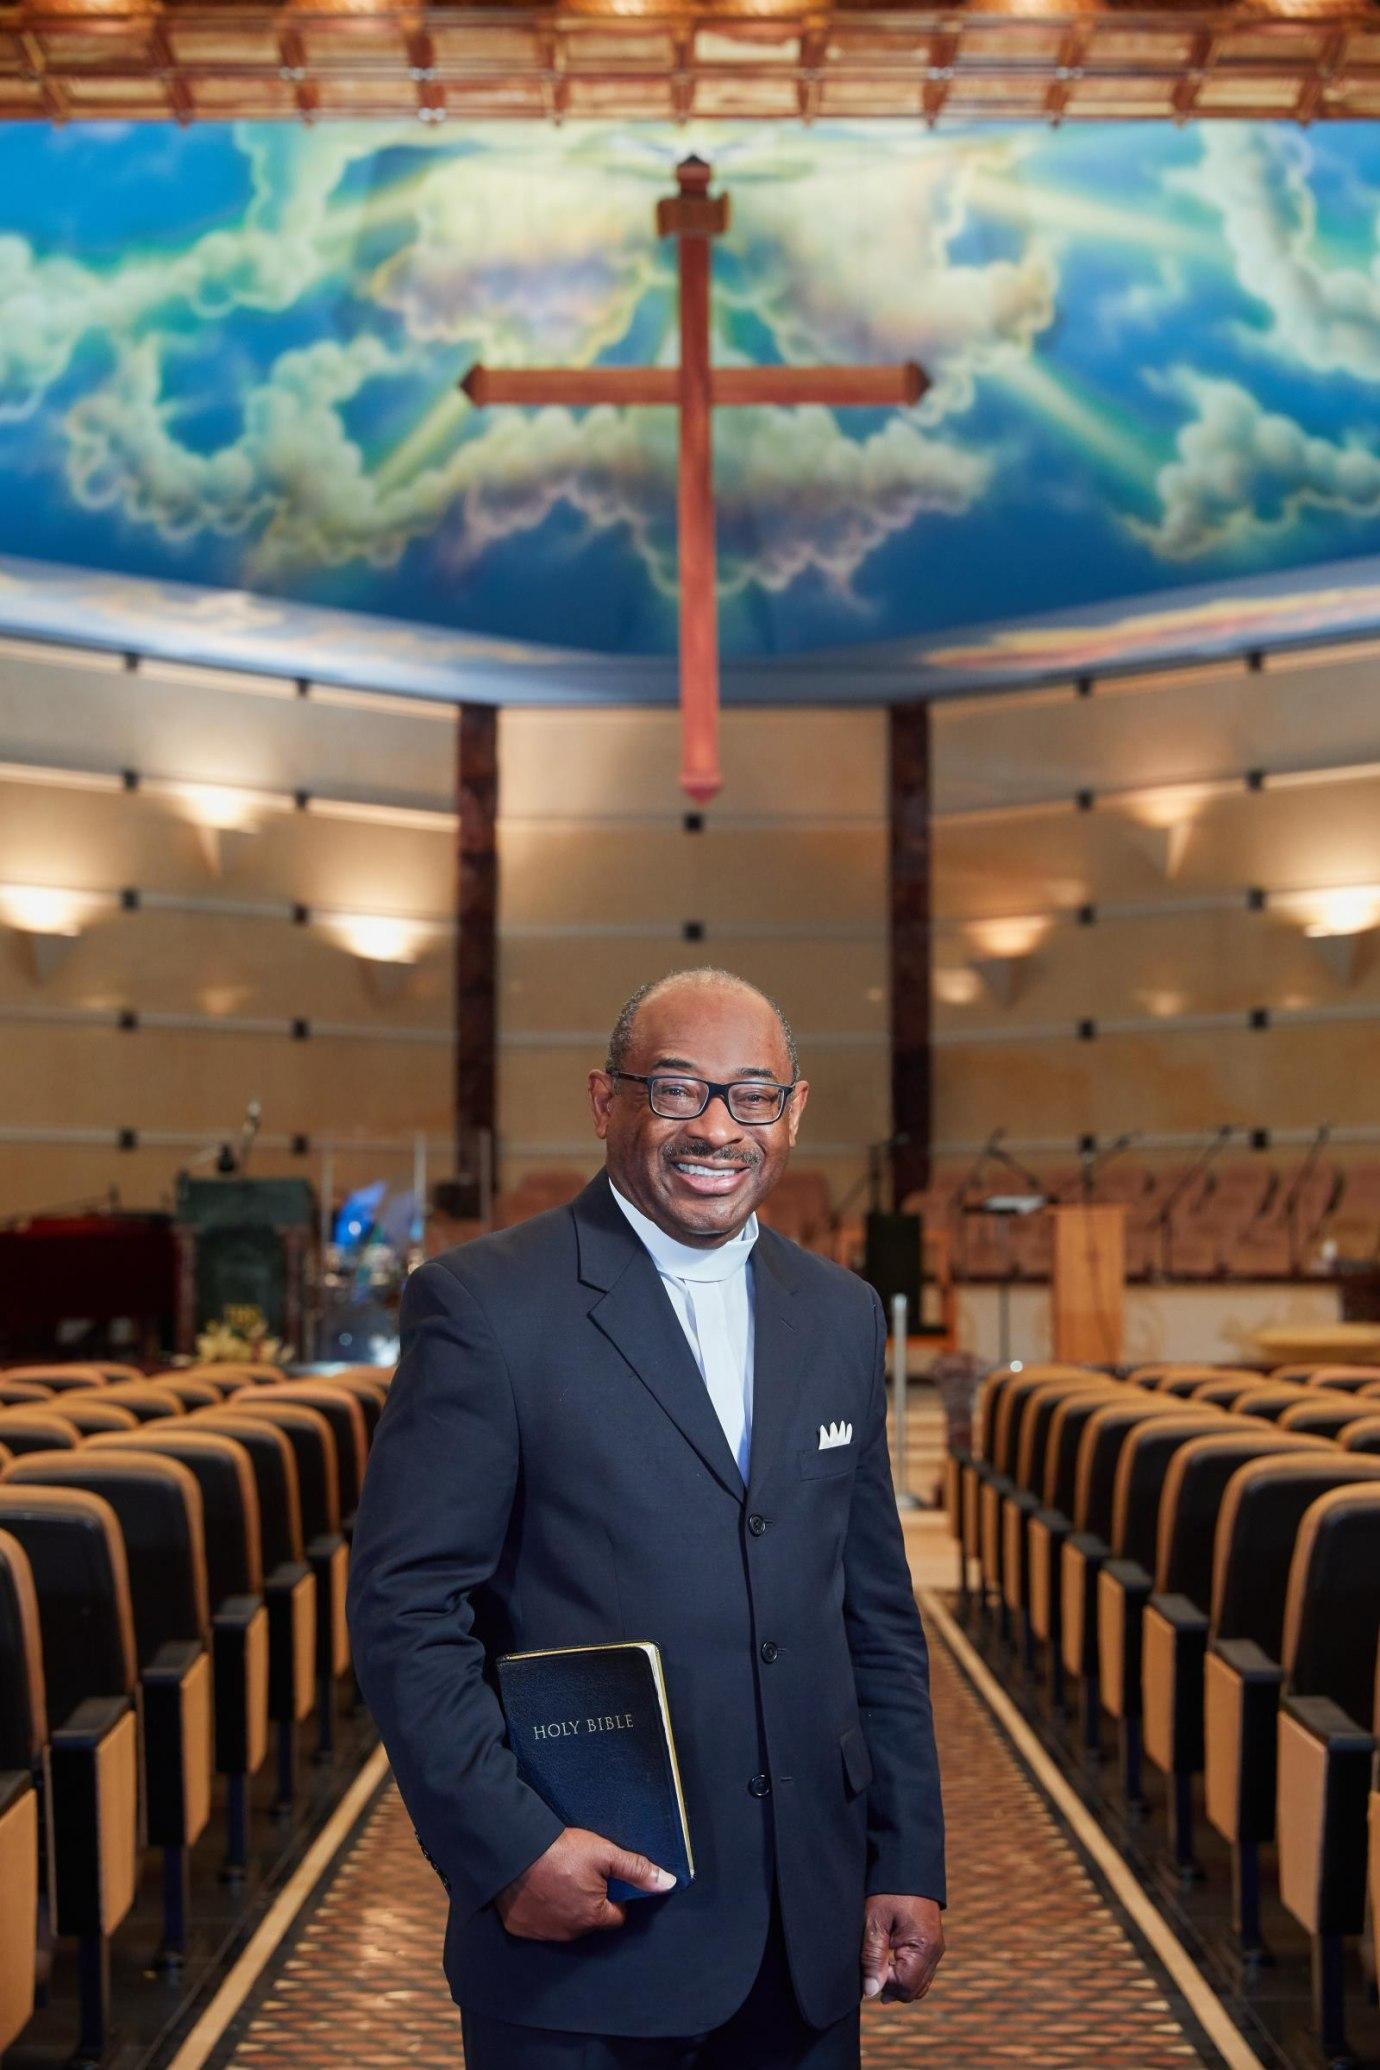 Reverend Moses L. Harvill